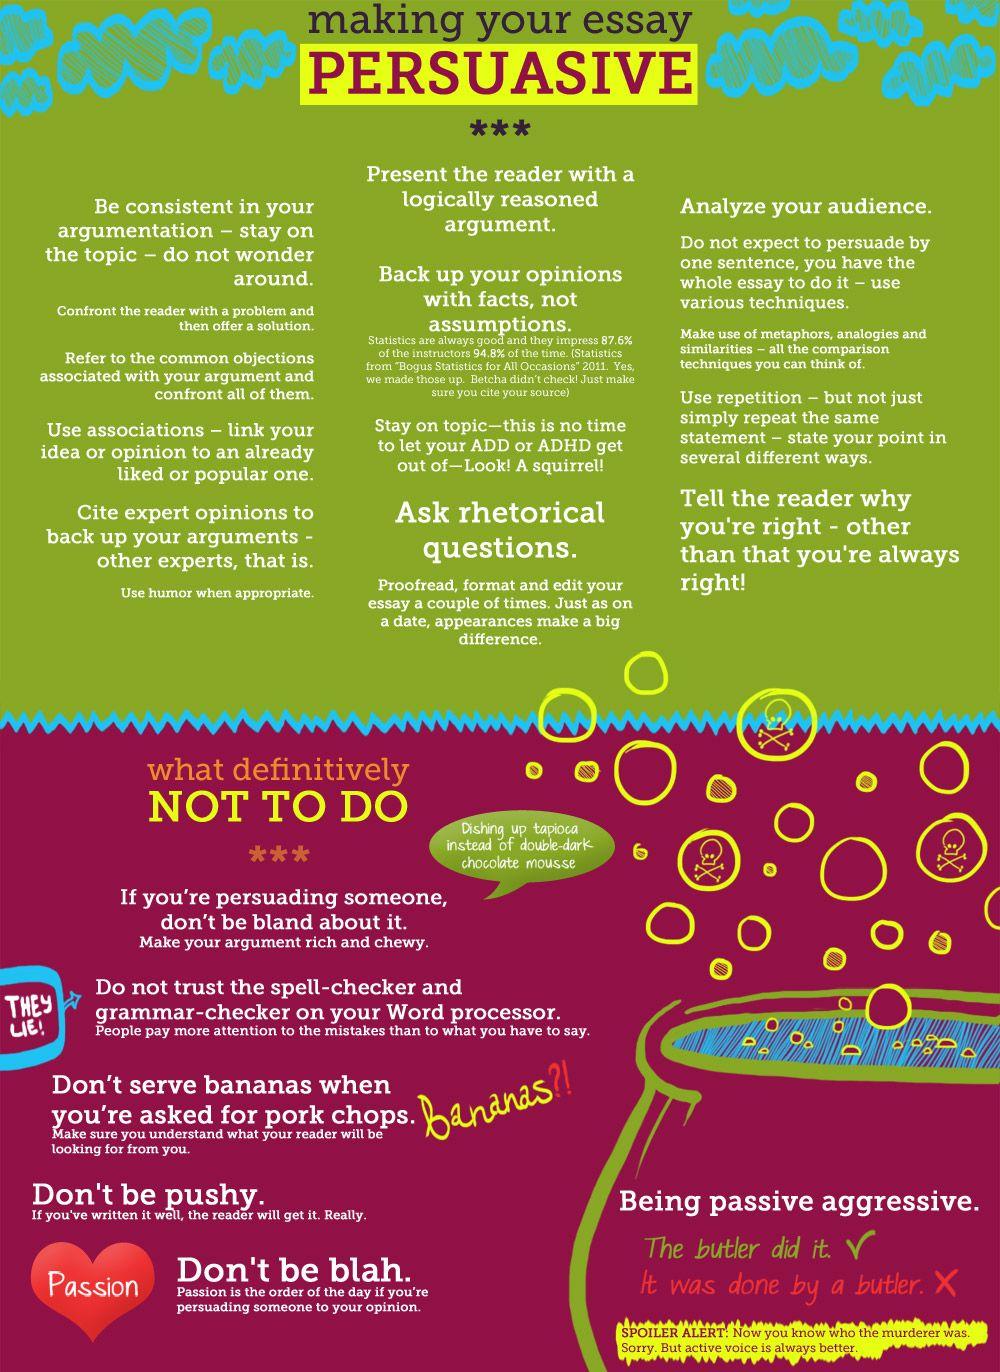 How To Make Your Essay Persuasive (с изображениями) Обучение